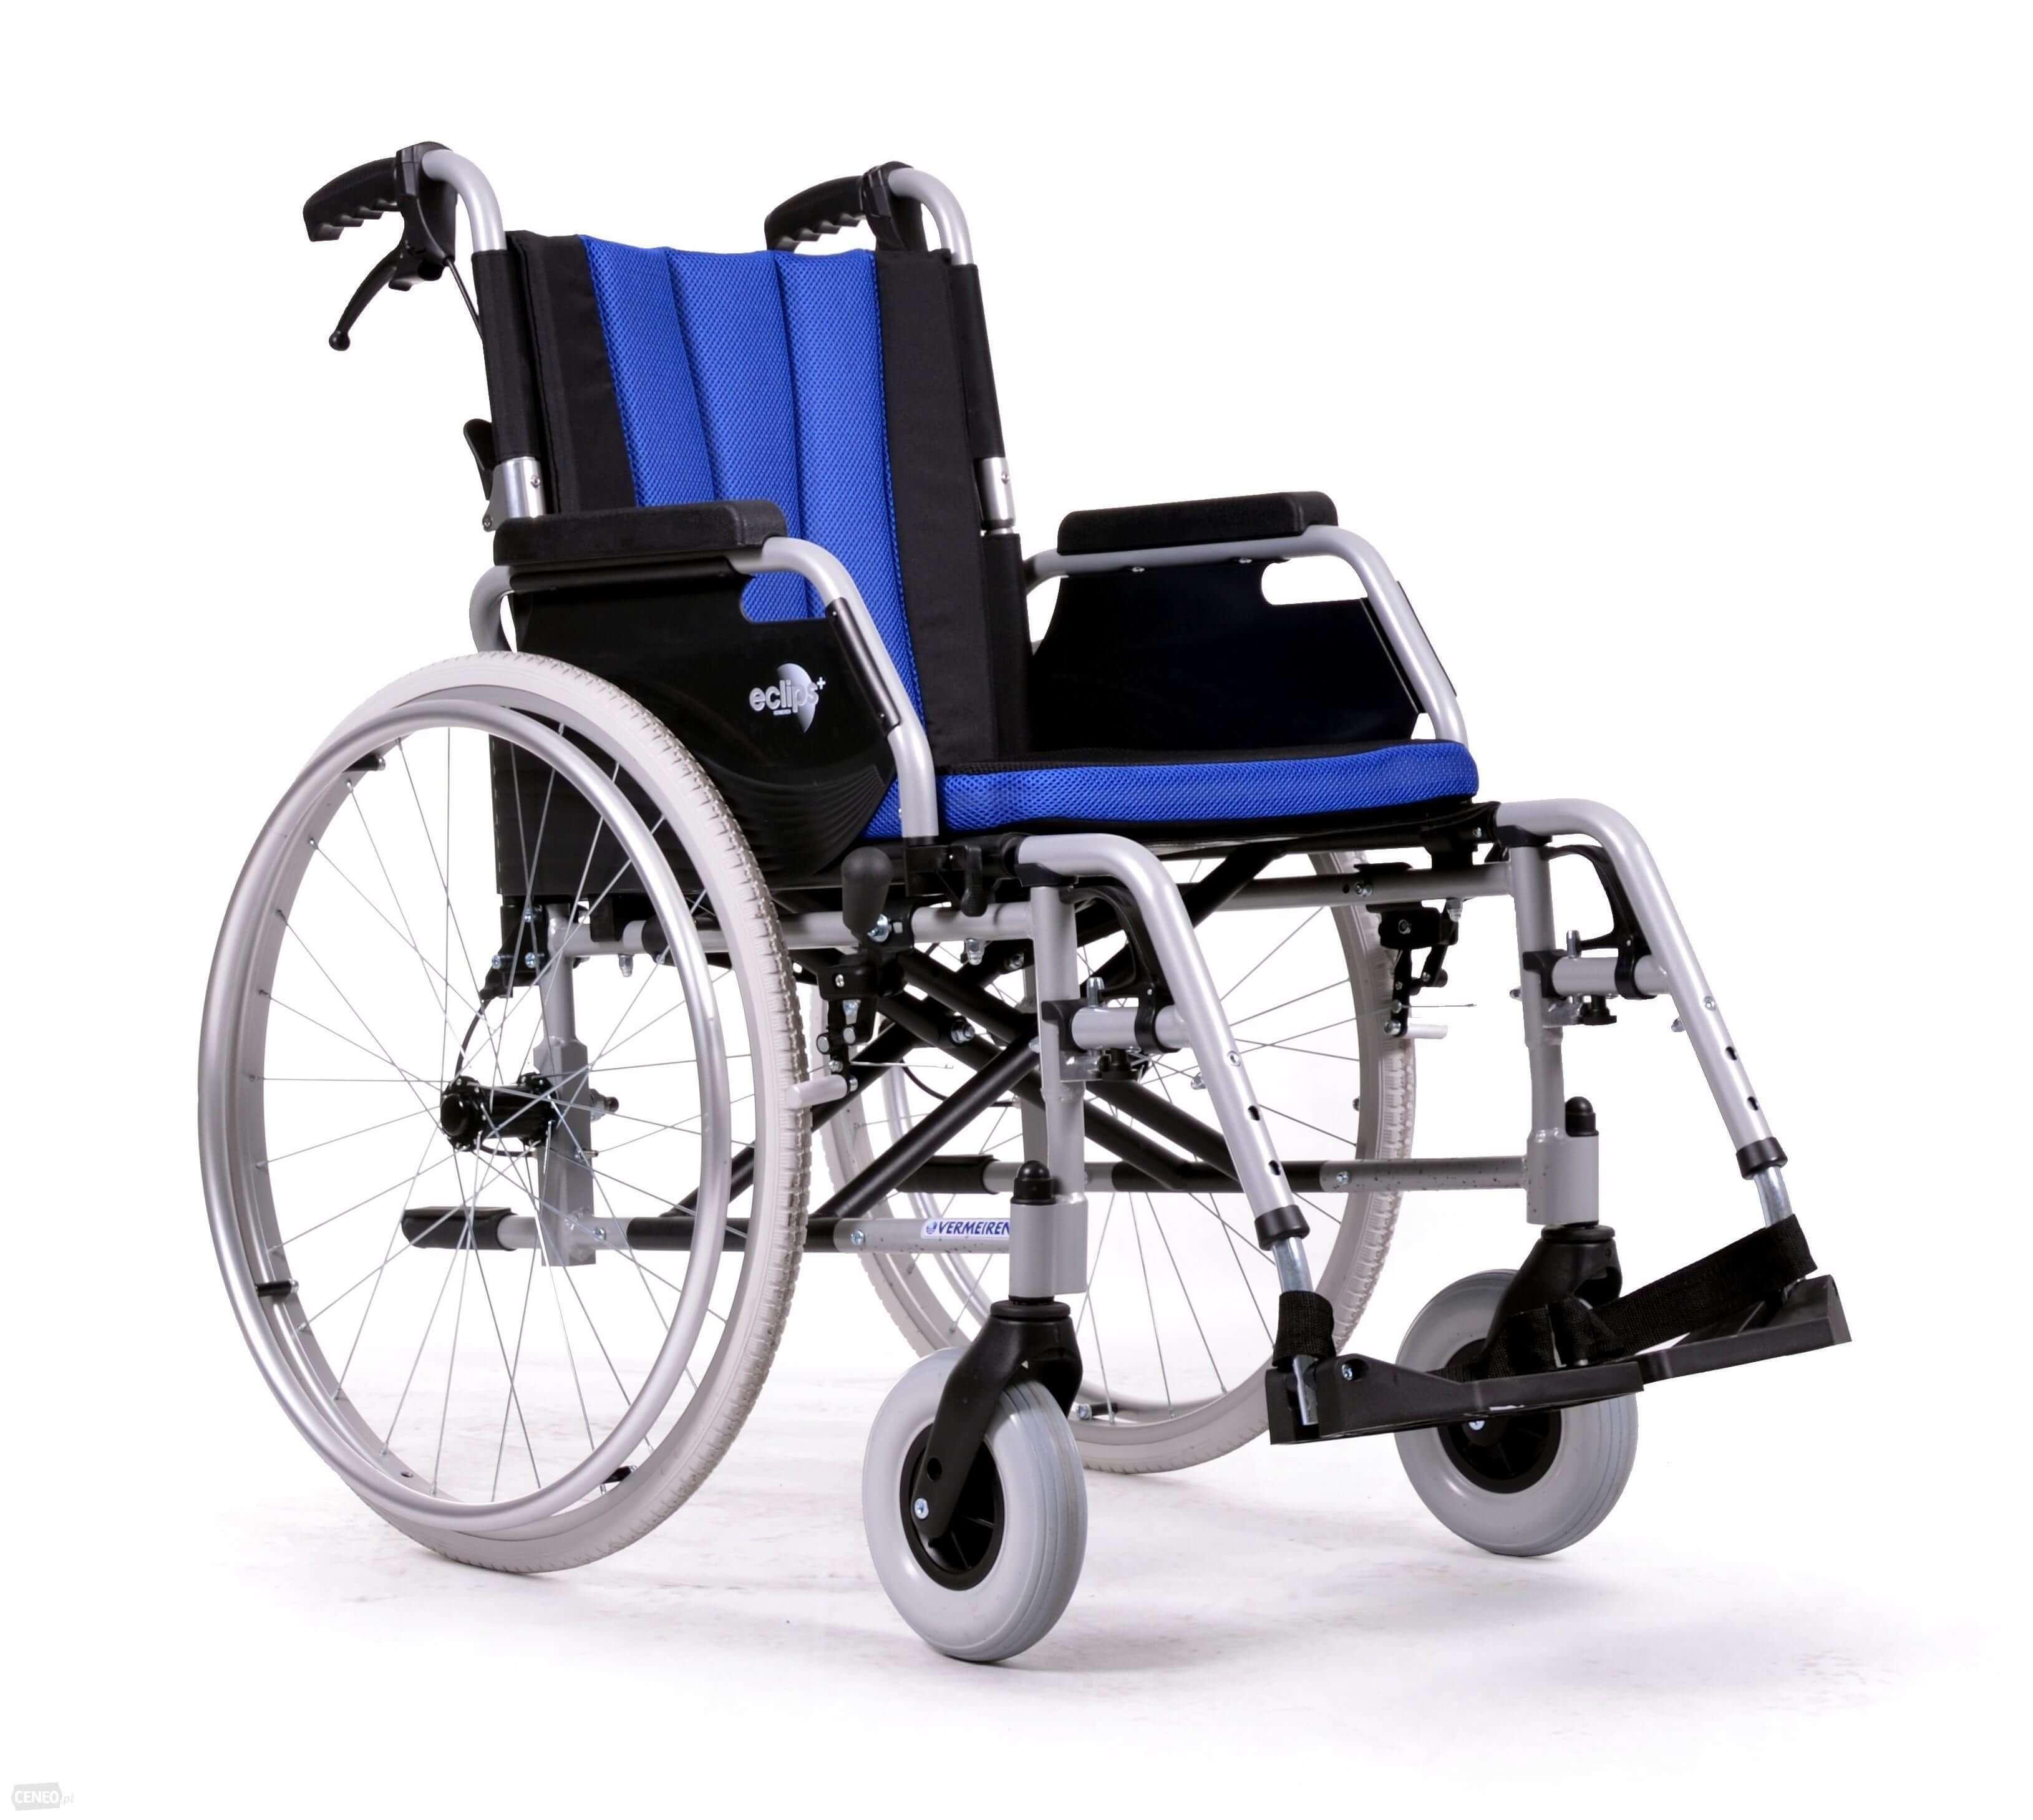 Wozek inwalidzki 1